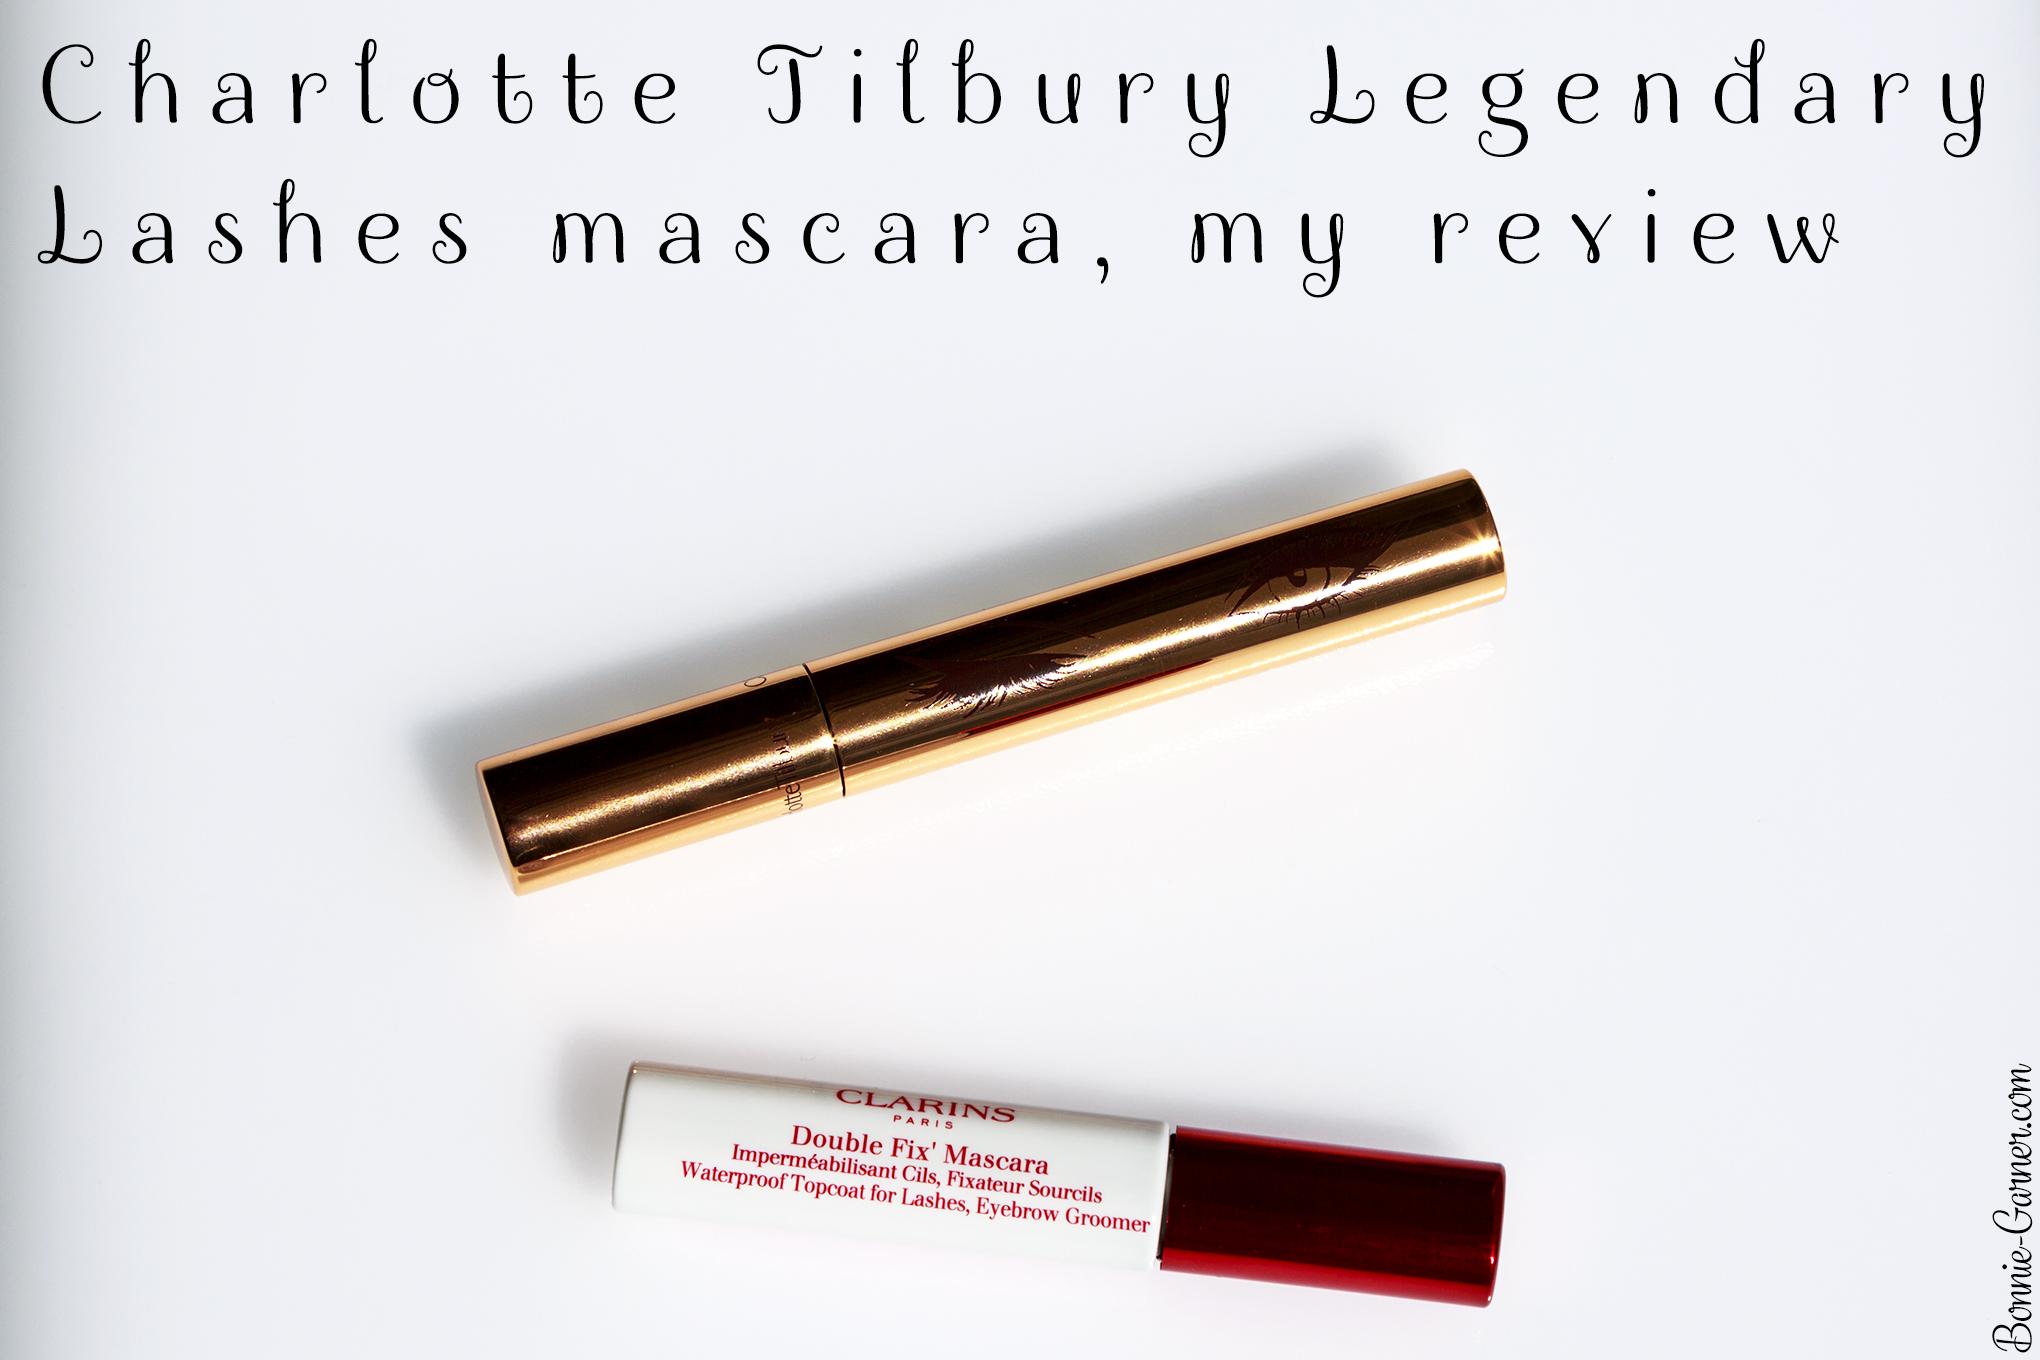 Charlotte Tilbury Legendary Lashes mascara, my review